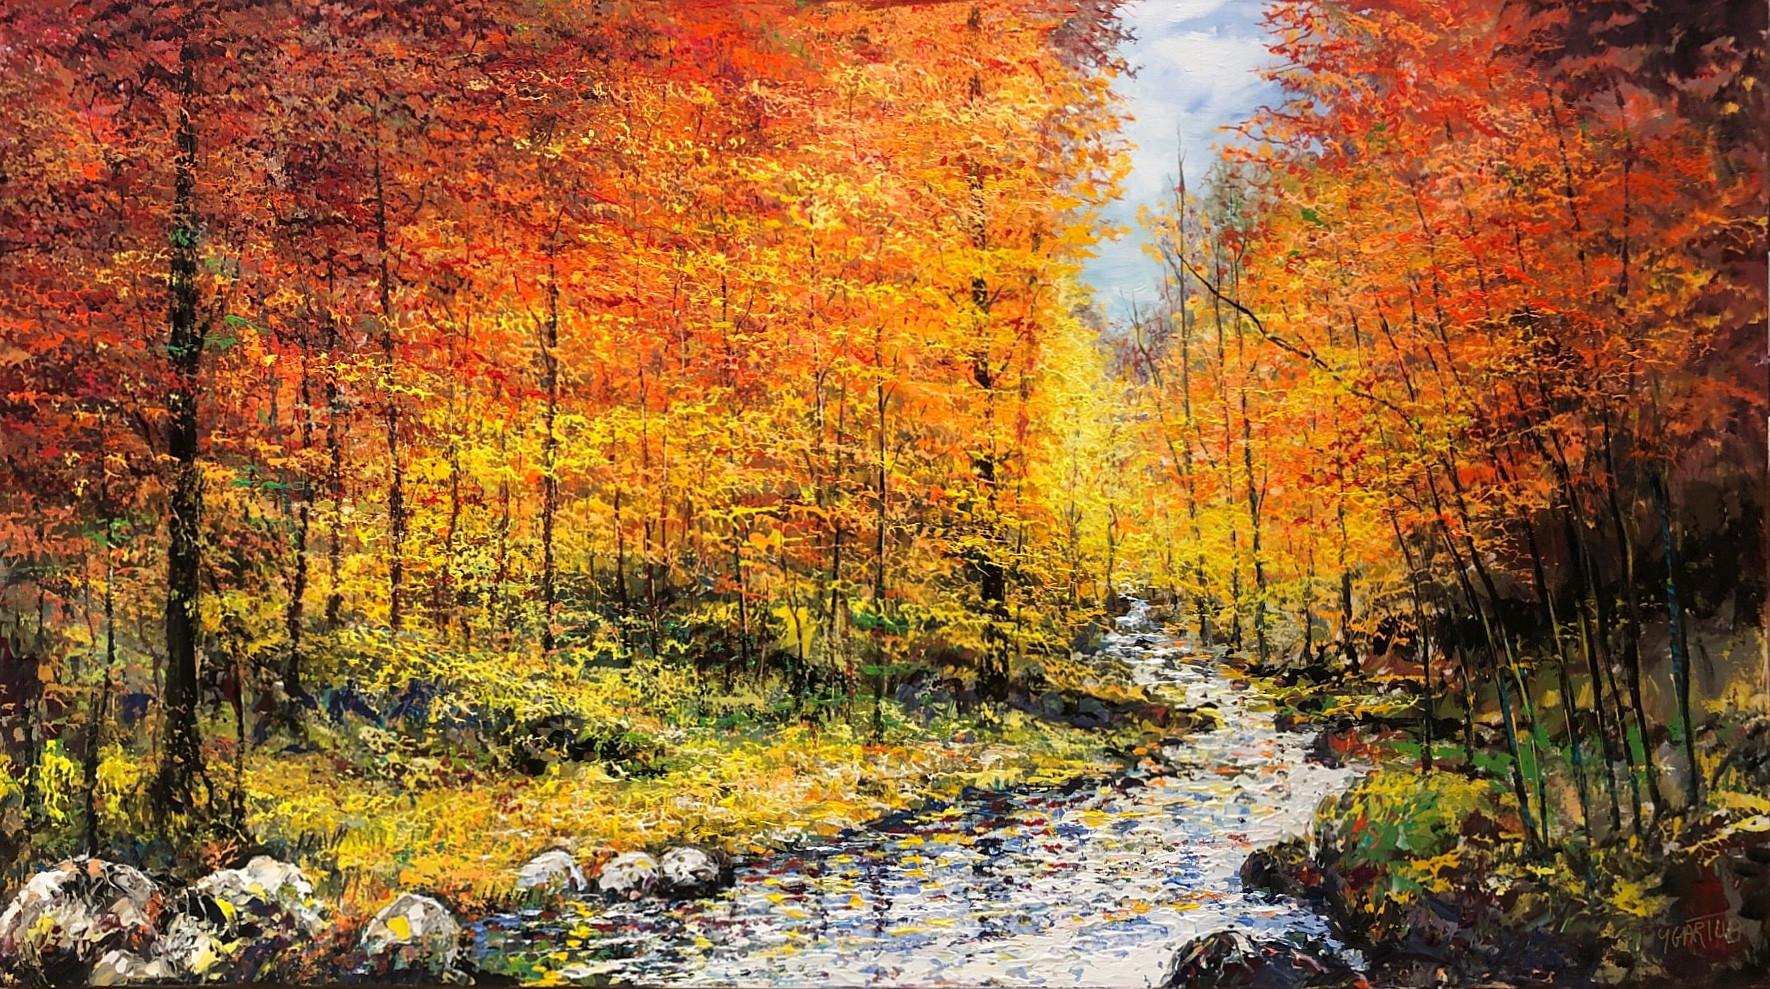 Autumn Reflections by Paul Ygartua